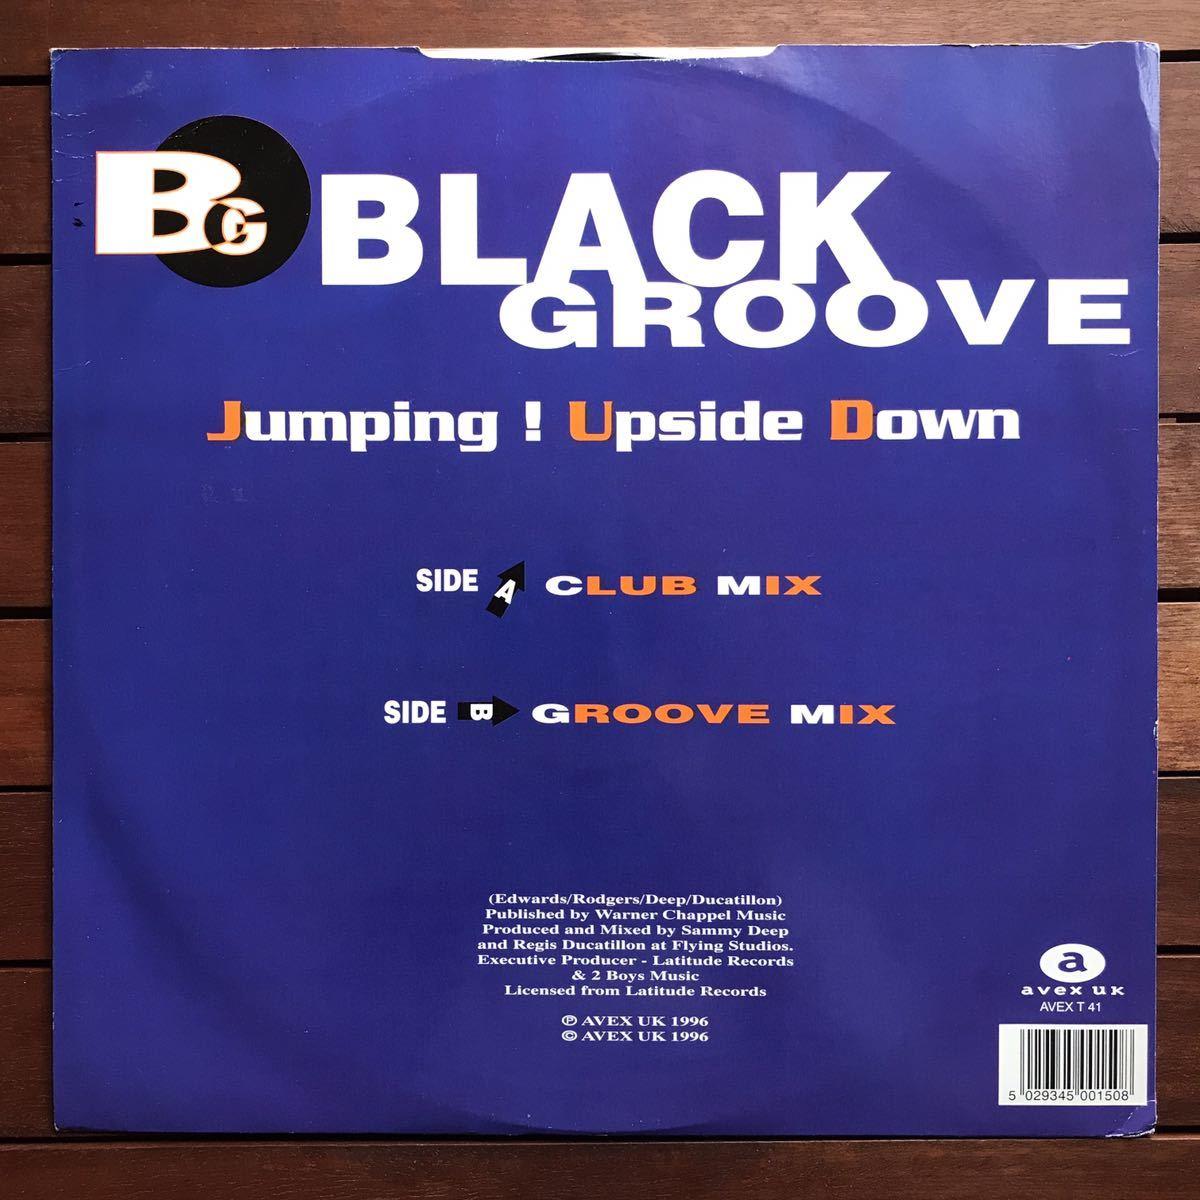 ●【eu-rap】Black Groove / Jumping ! Upside Down[12inch]オリジナル盤